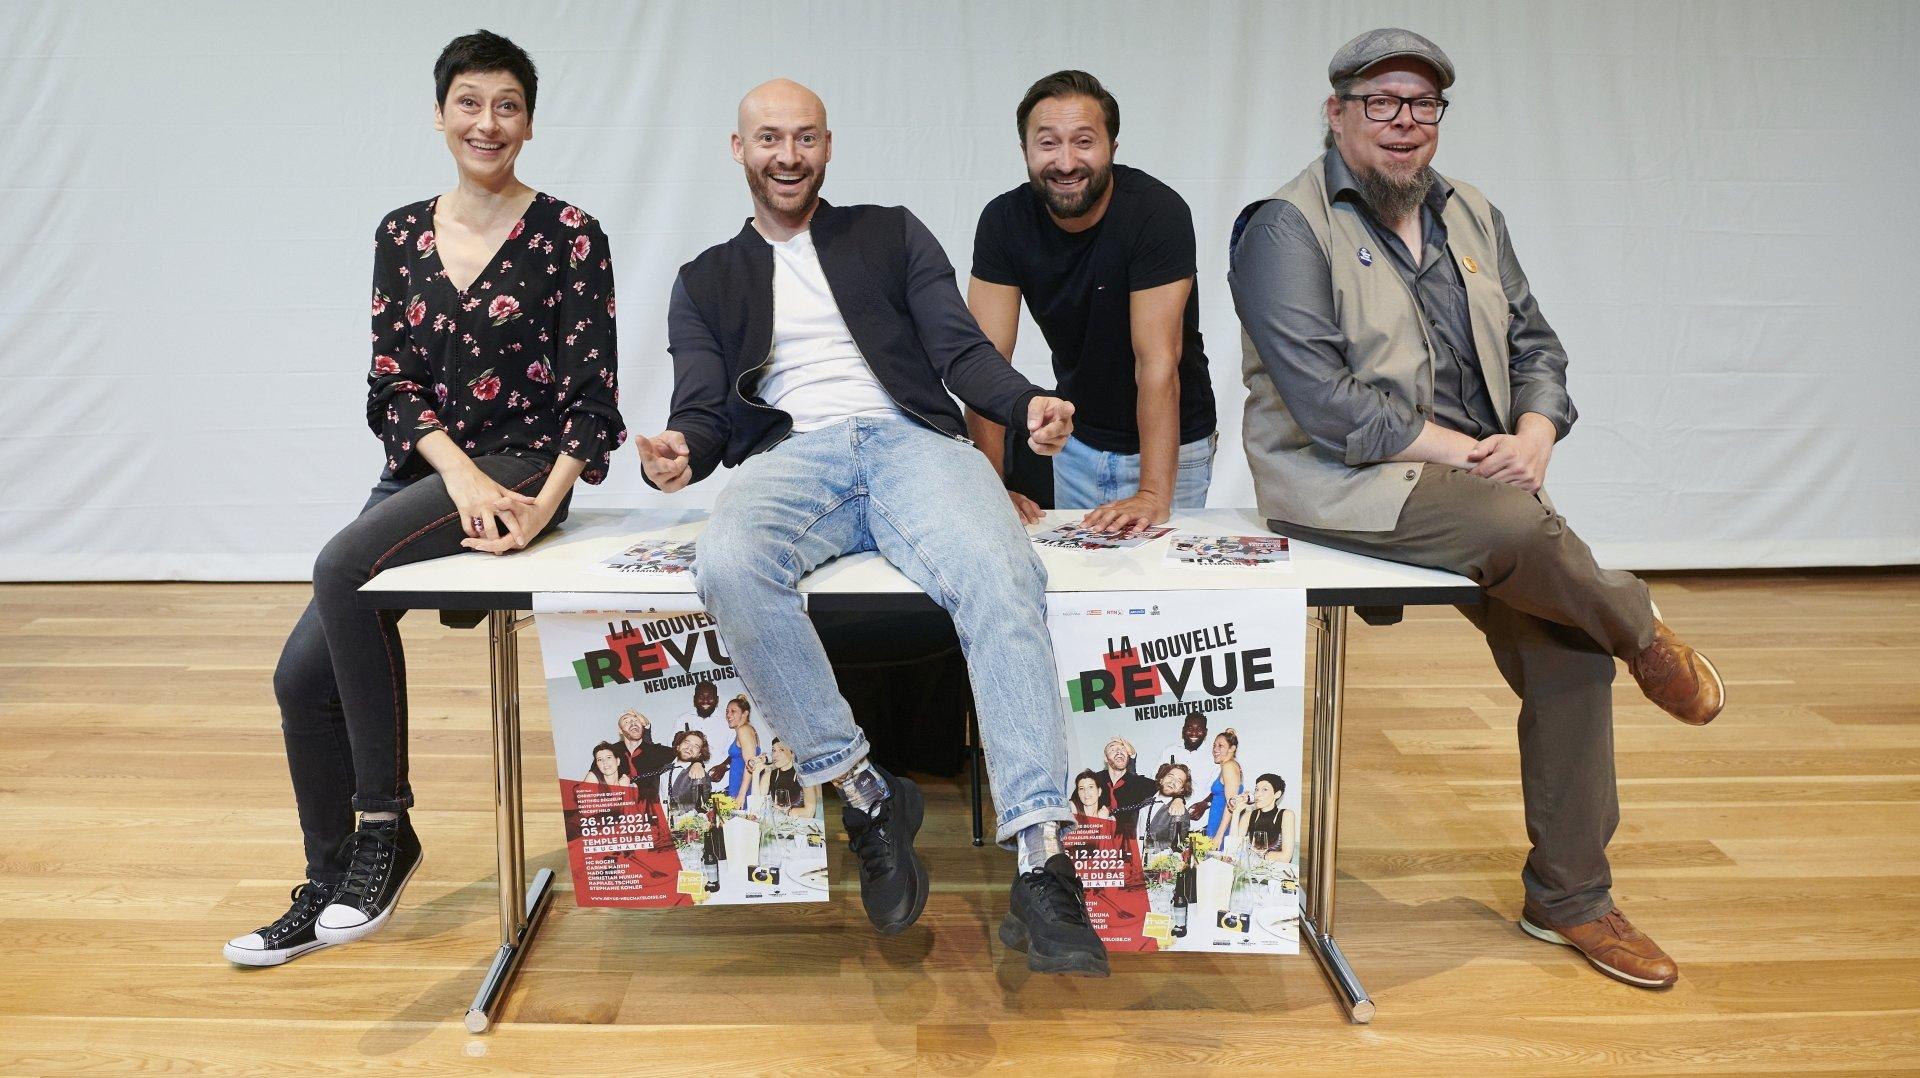 De gauche à droite: Mado Sierro, David Charles Haeberli (alias MC Roger), Avni Krasniqi et Matthieu Béguelin ce mercredi 15 septembre à Neuchâtel.